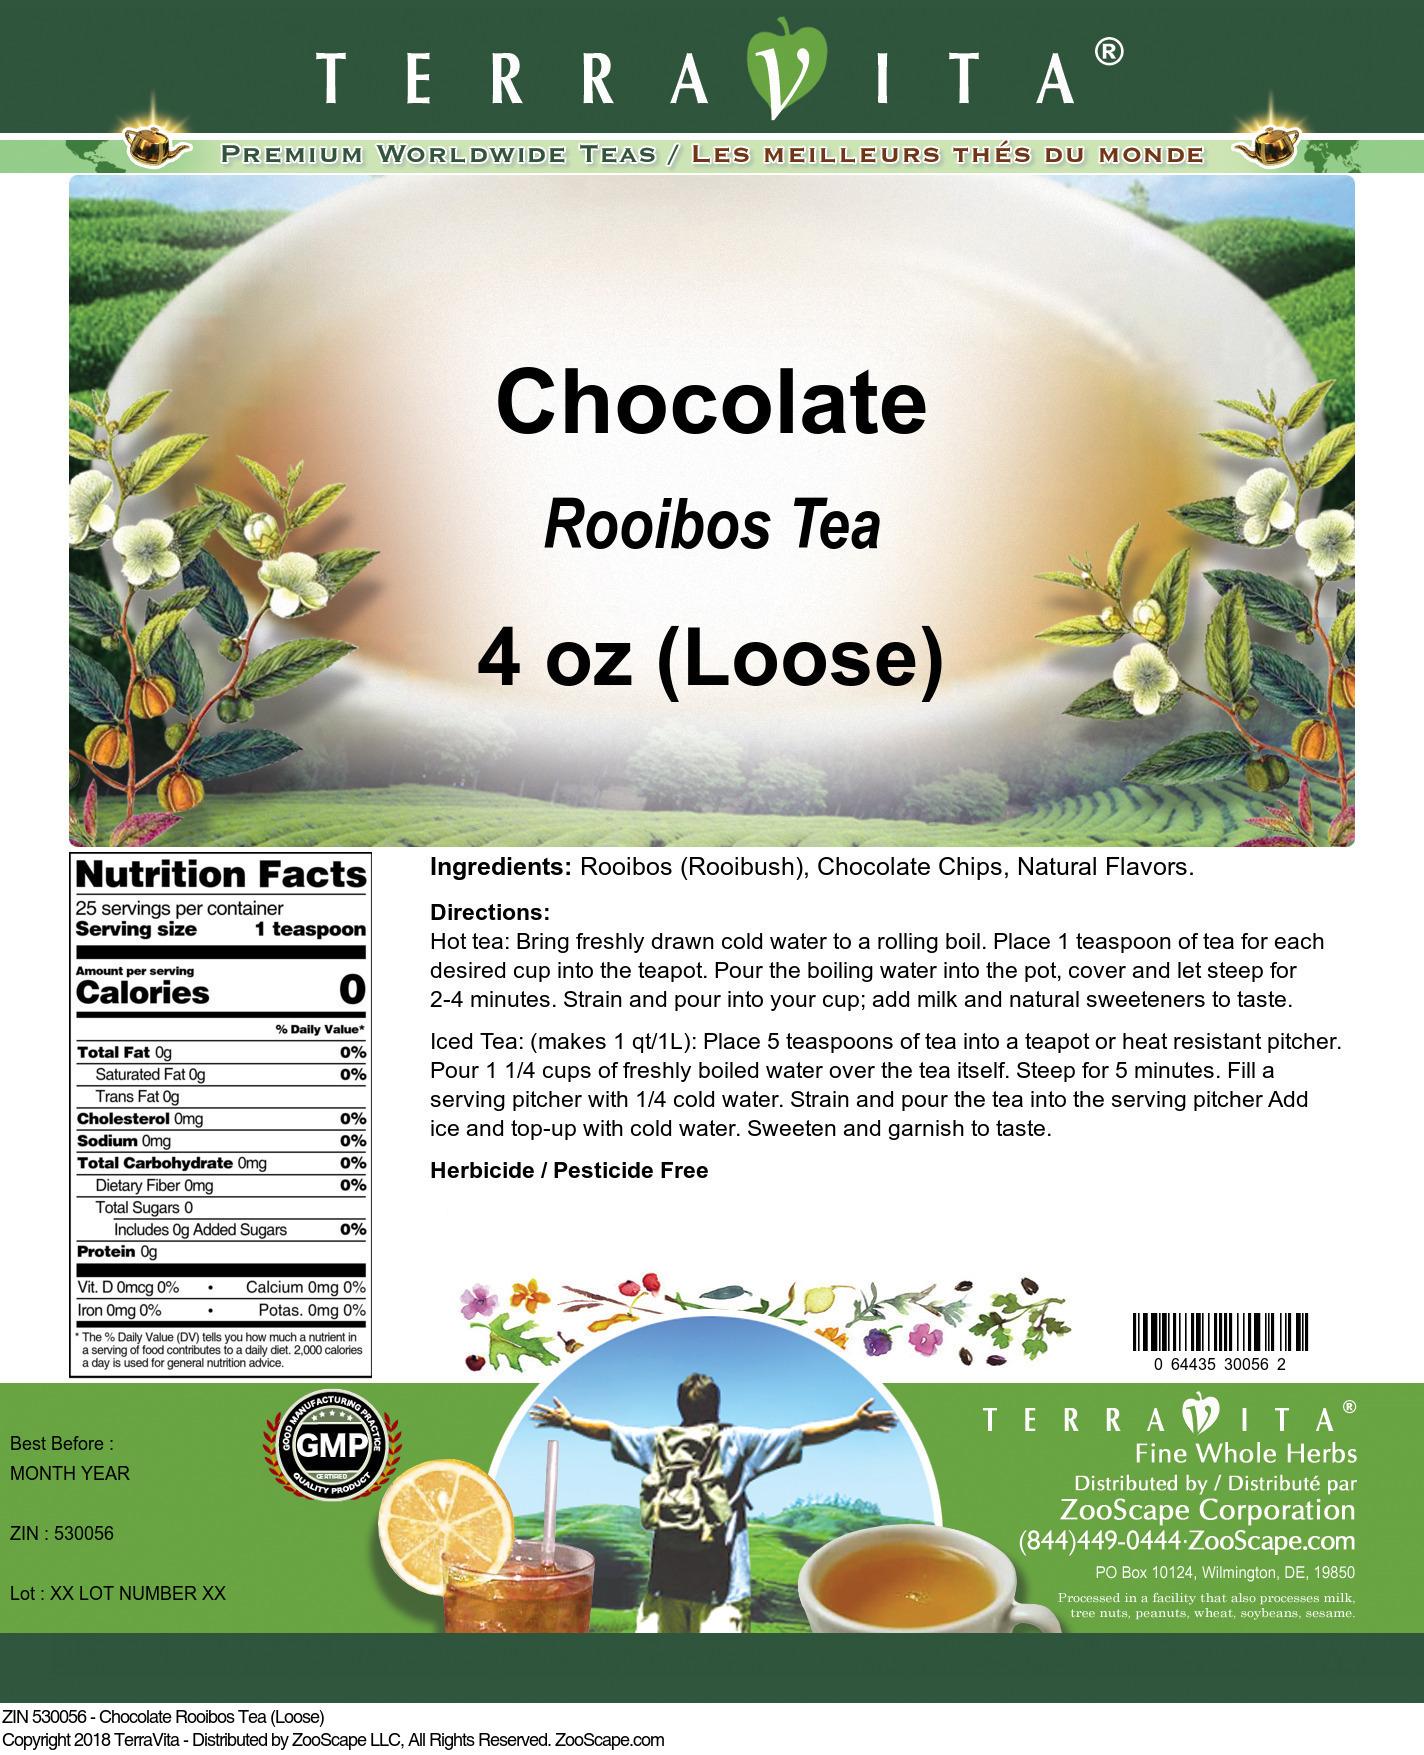 Chocolate Rooibos Tea (Loose)